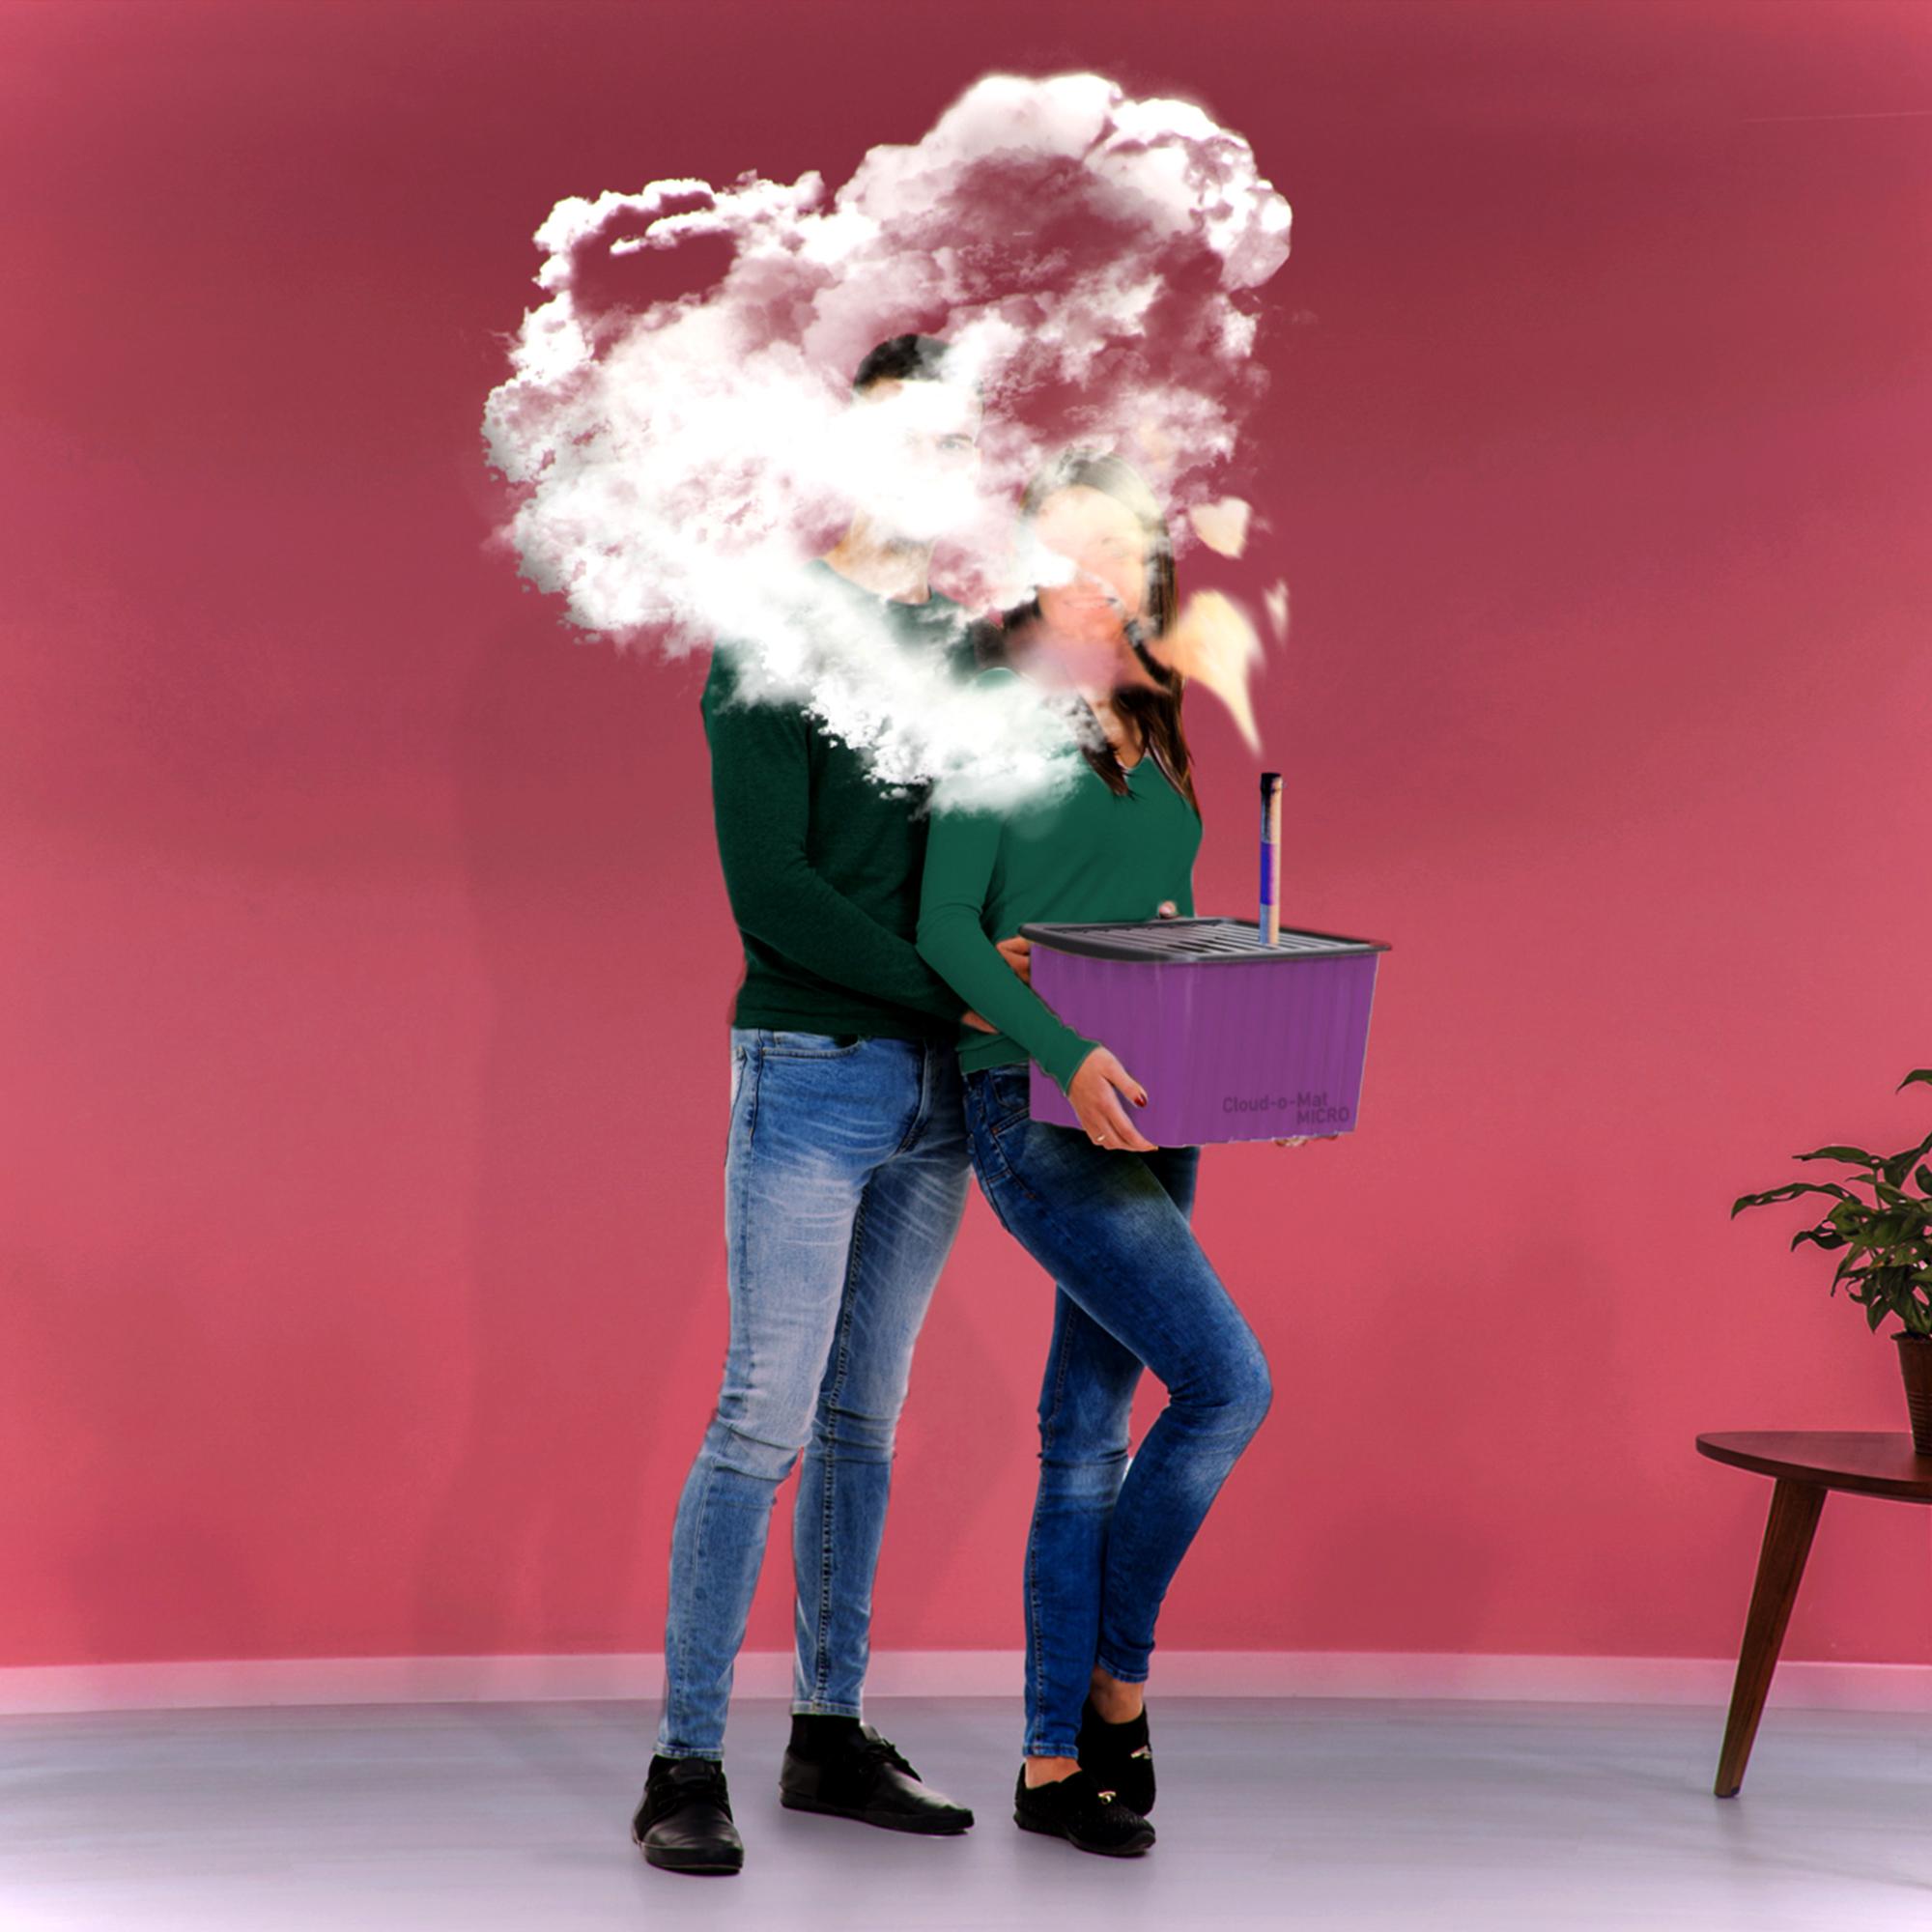 Romantischer Fallschirmsprung durch Wolke 7 - 4